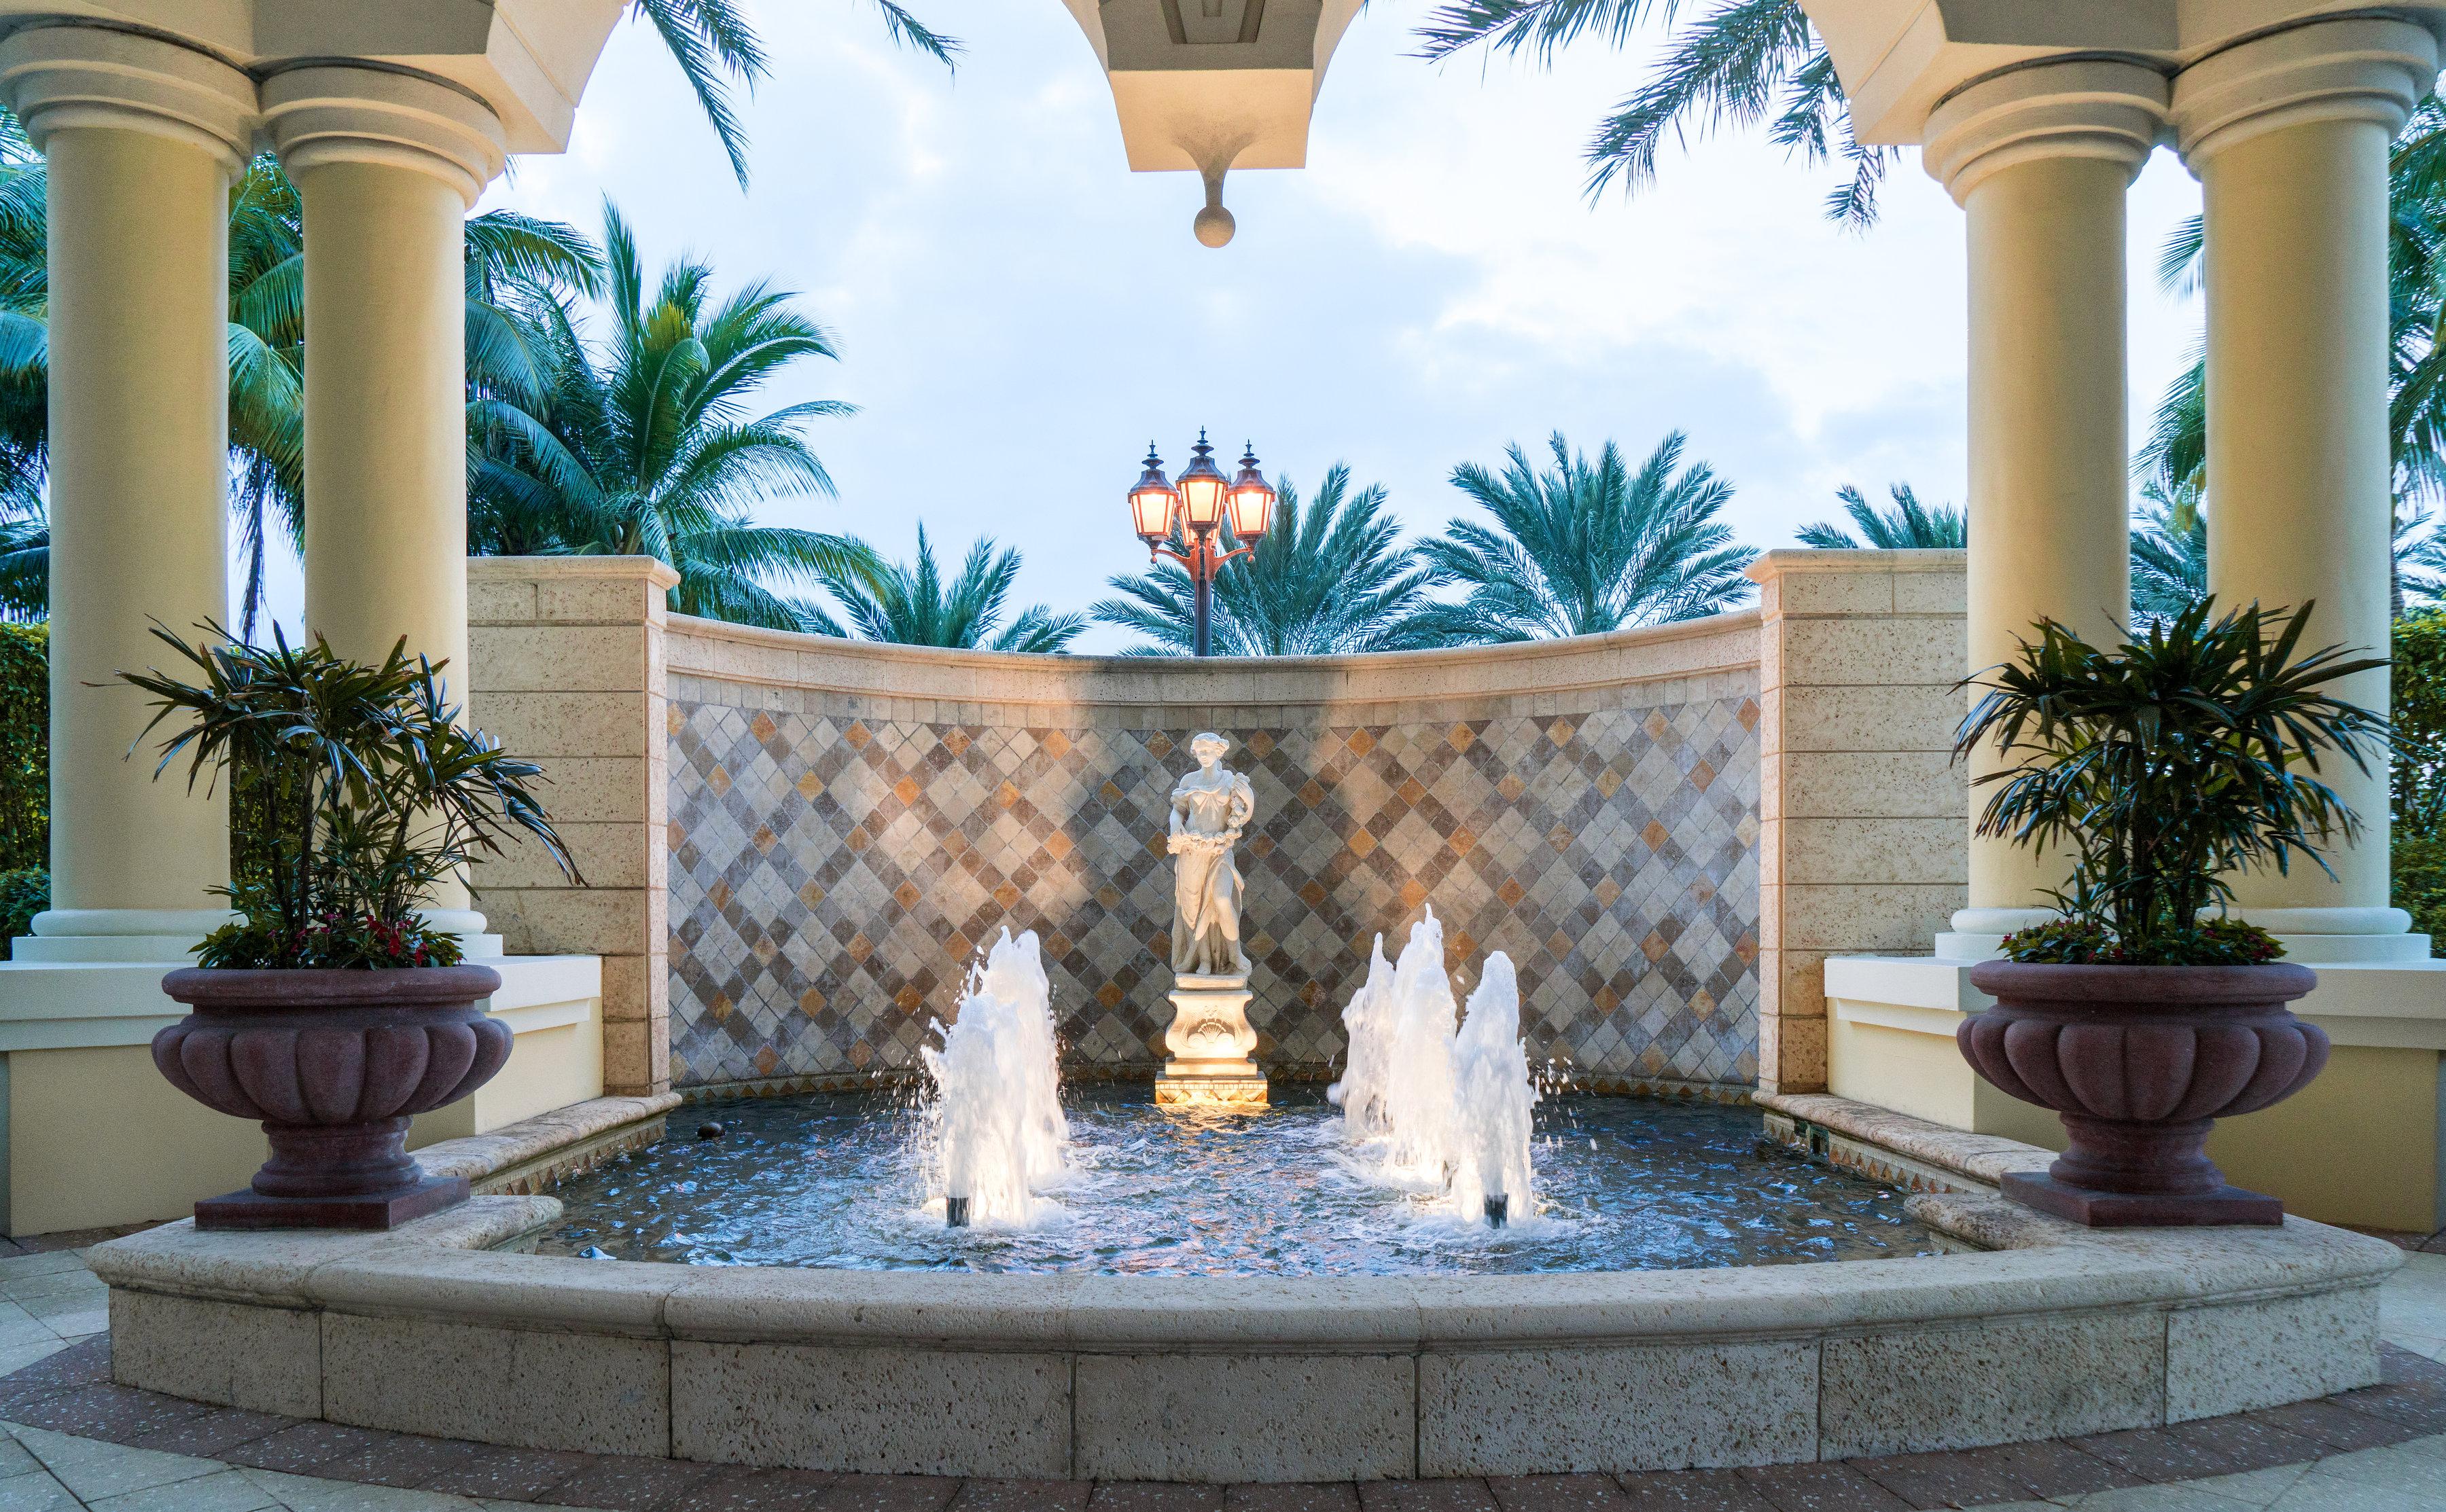 Acqualina Fountains